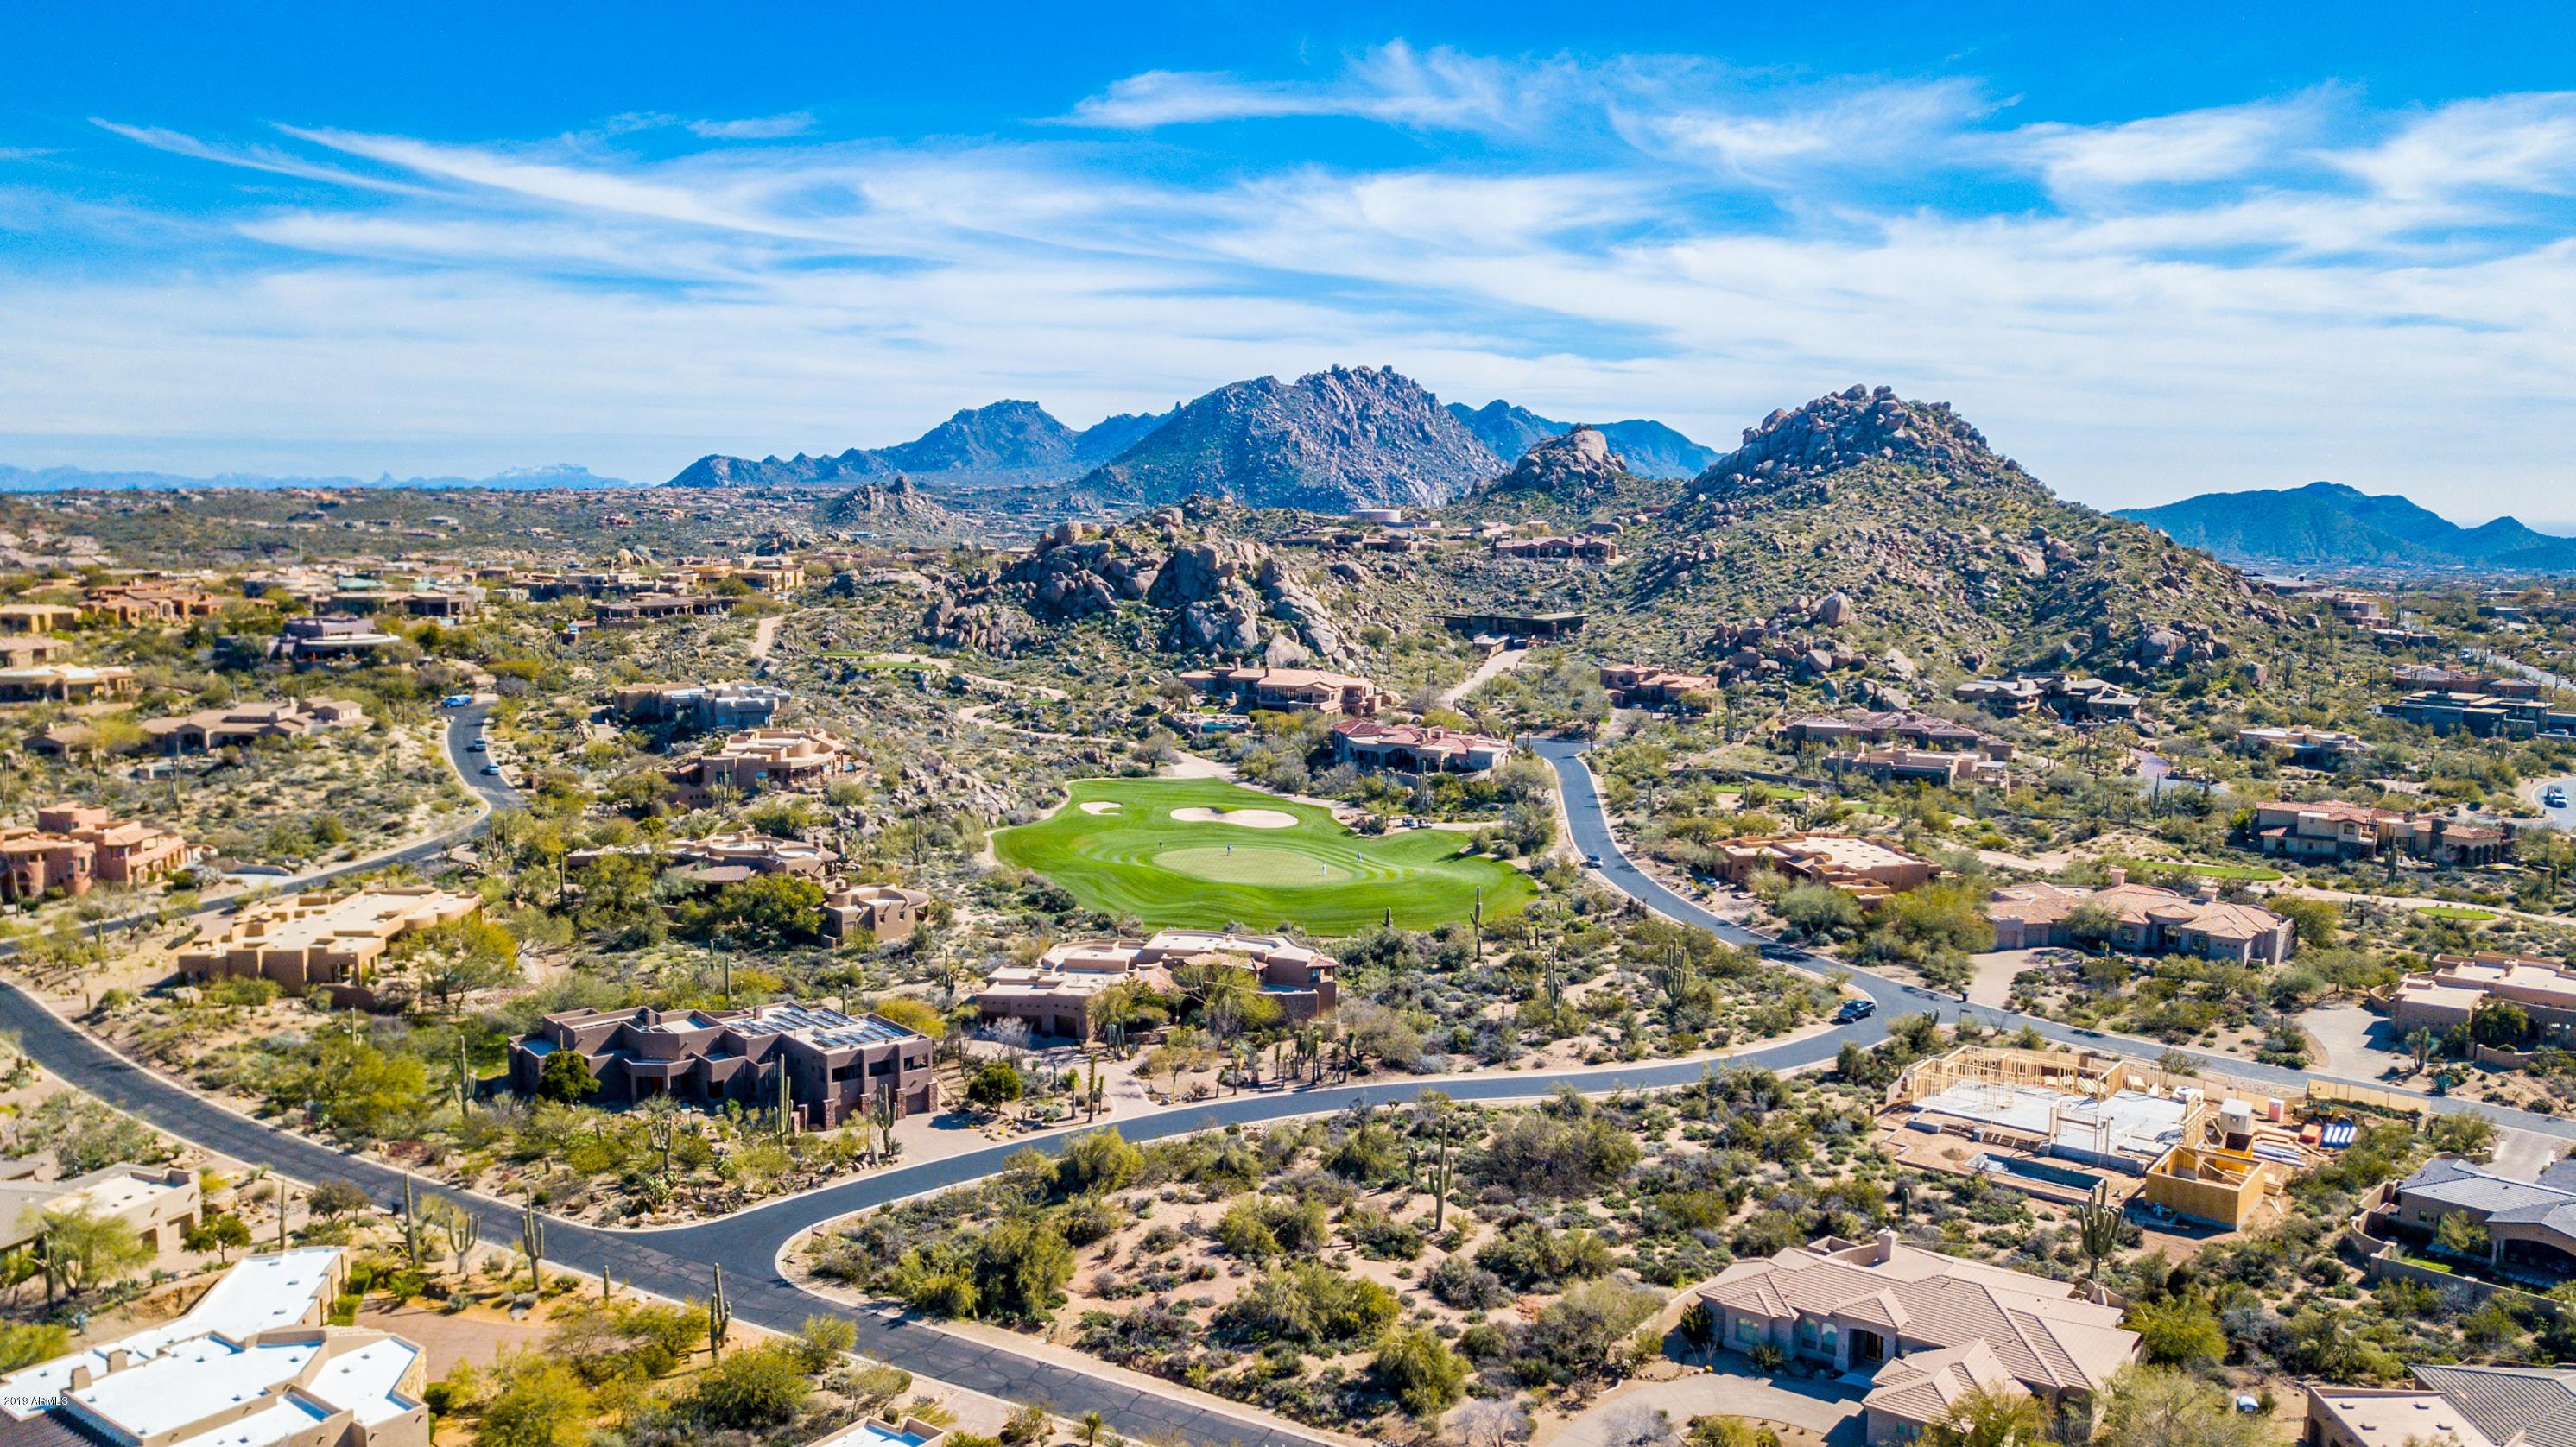 MLS 5890345 28509 N 104th Street, Scottsdale, AZ 85262 Scottsdale AZ Private Pool